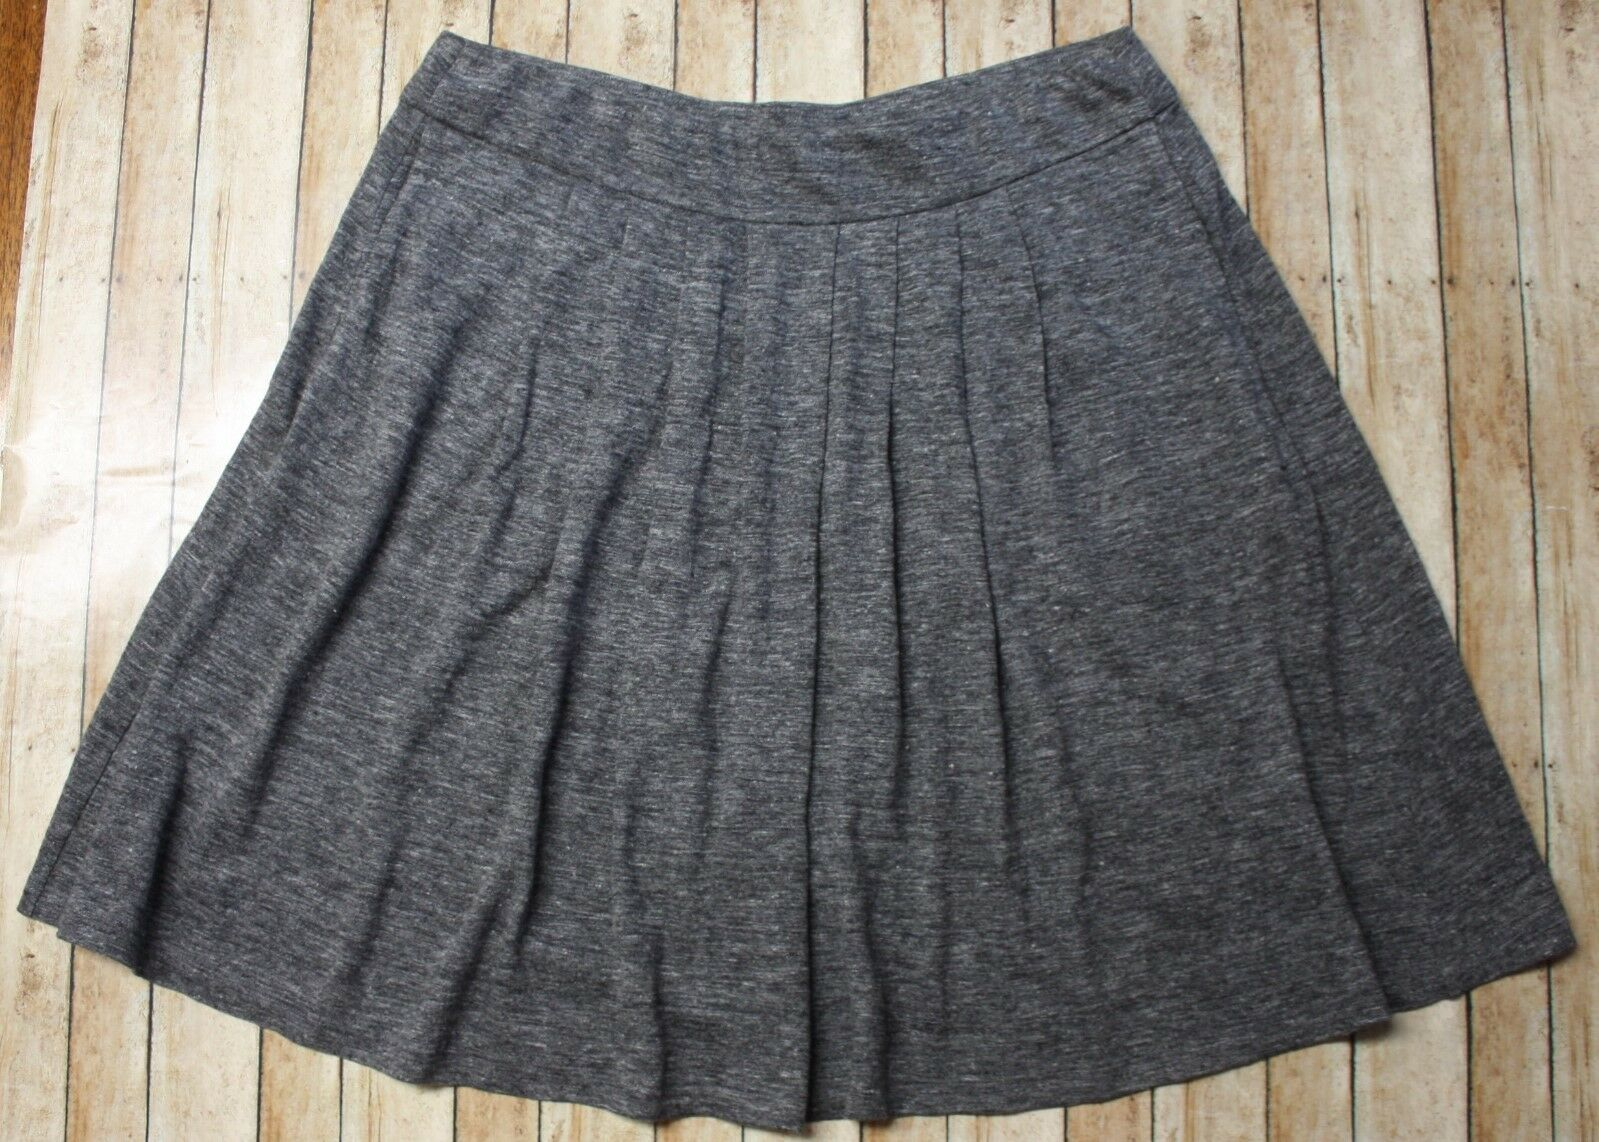 Eileen Fisher Linen Jersey Melange Pleated Skirt Womens Small Graphite Grey